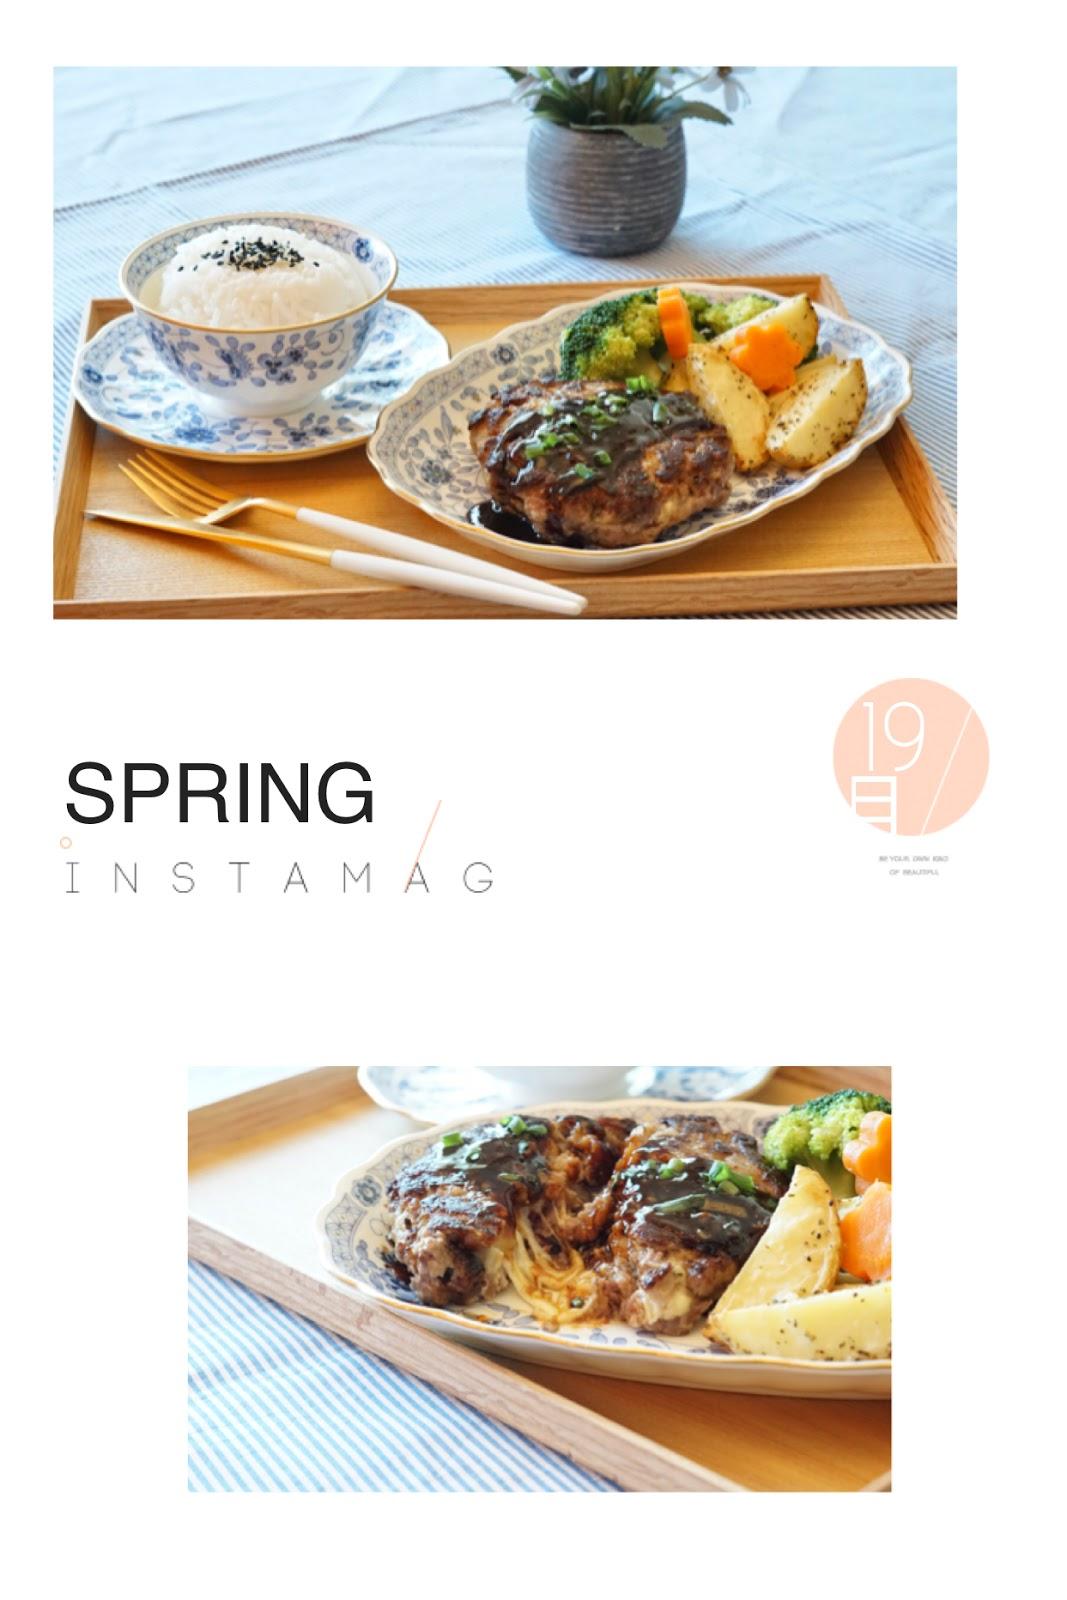 Michelle - 瘋狂煮婦: 日式芝心牛肉漢堡